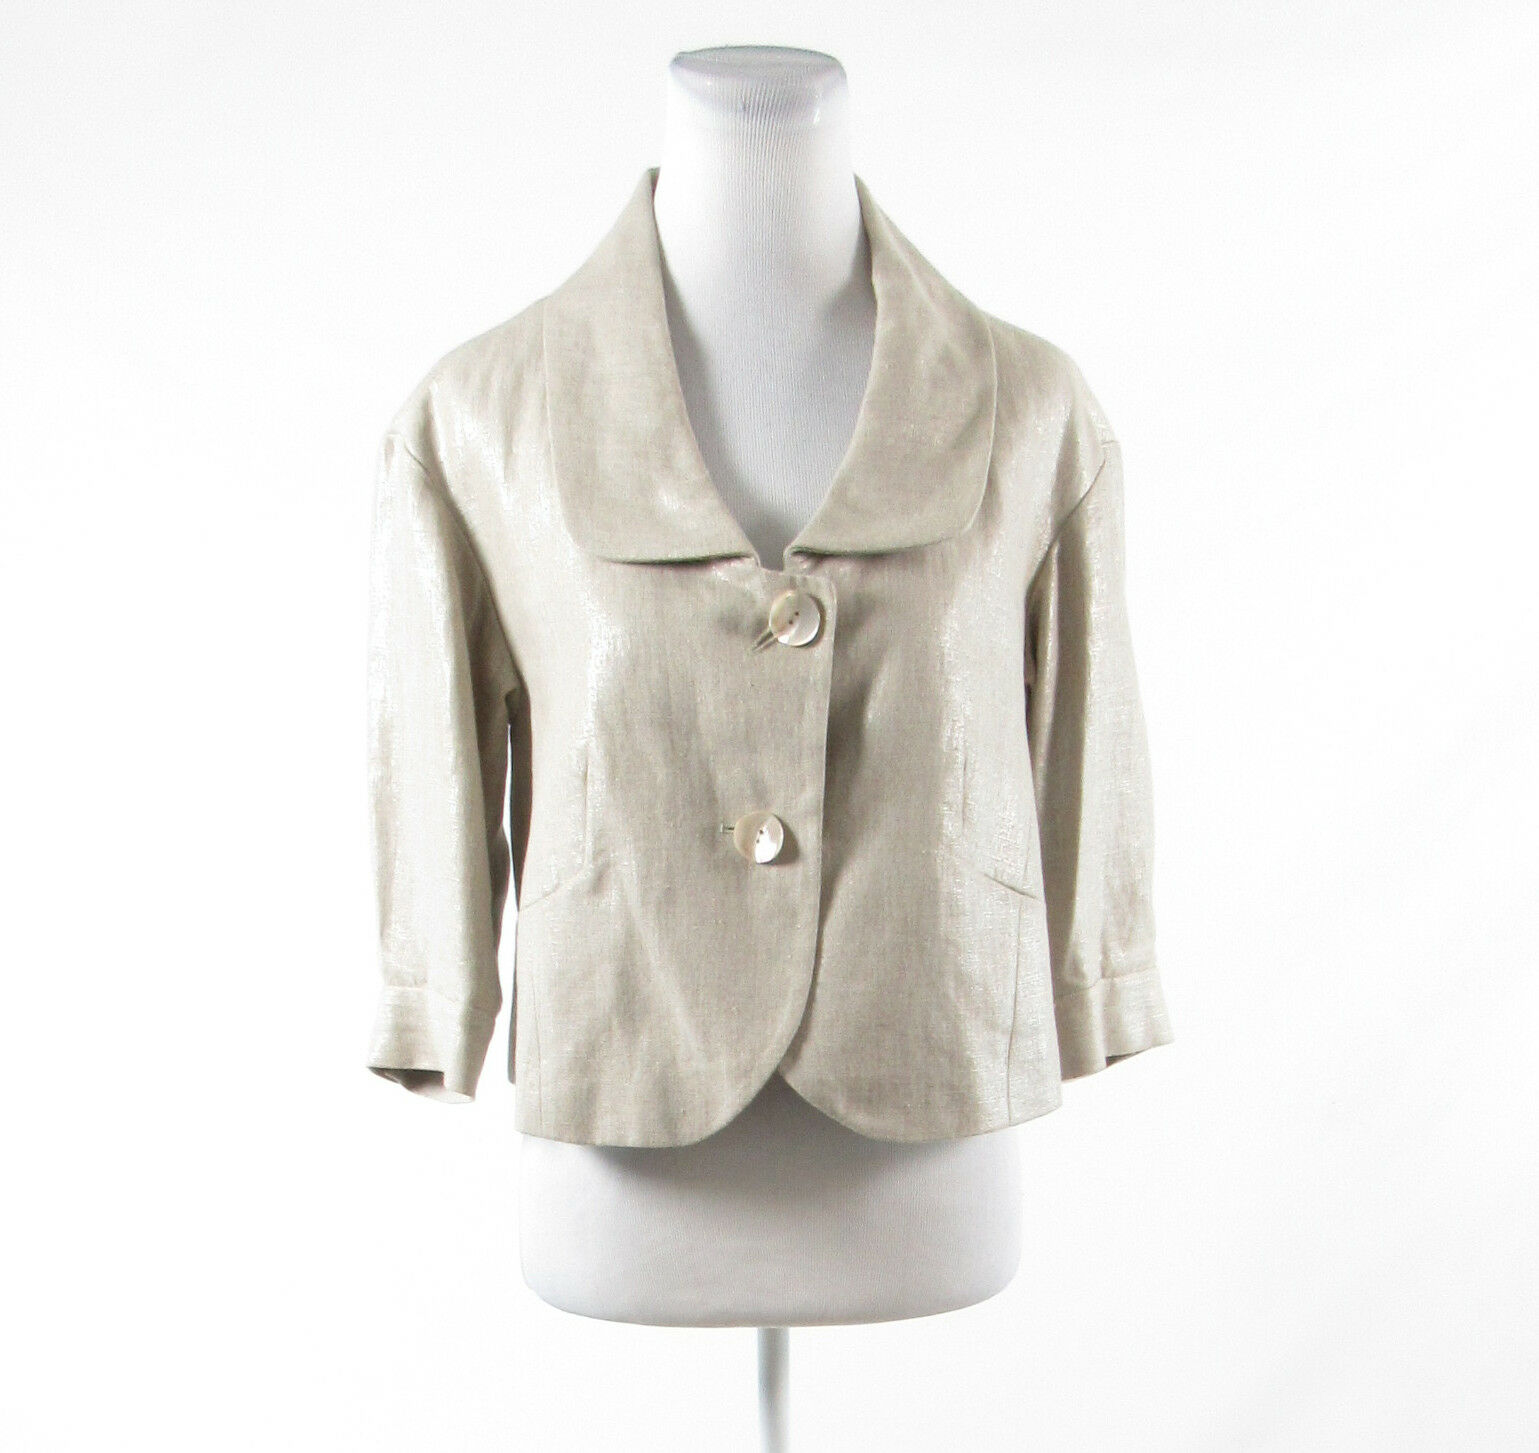 Light beige 100% linen WORTH shimmery 1/2 sleeve jacket 4